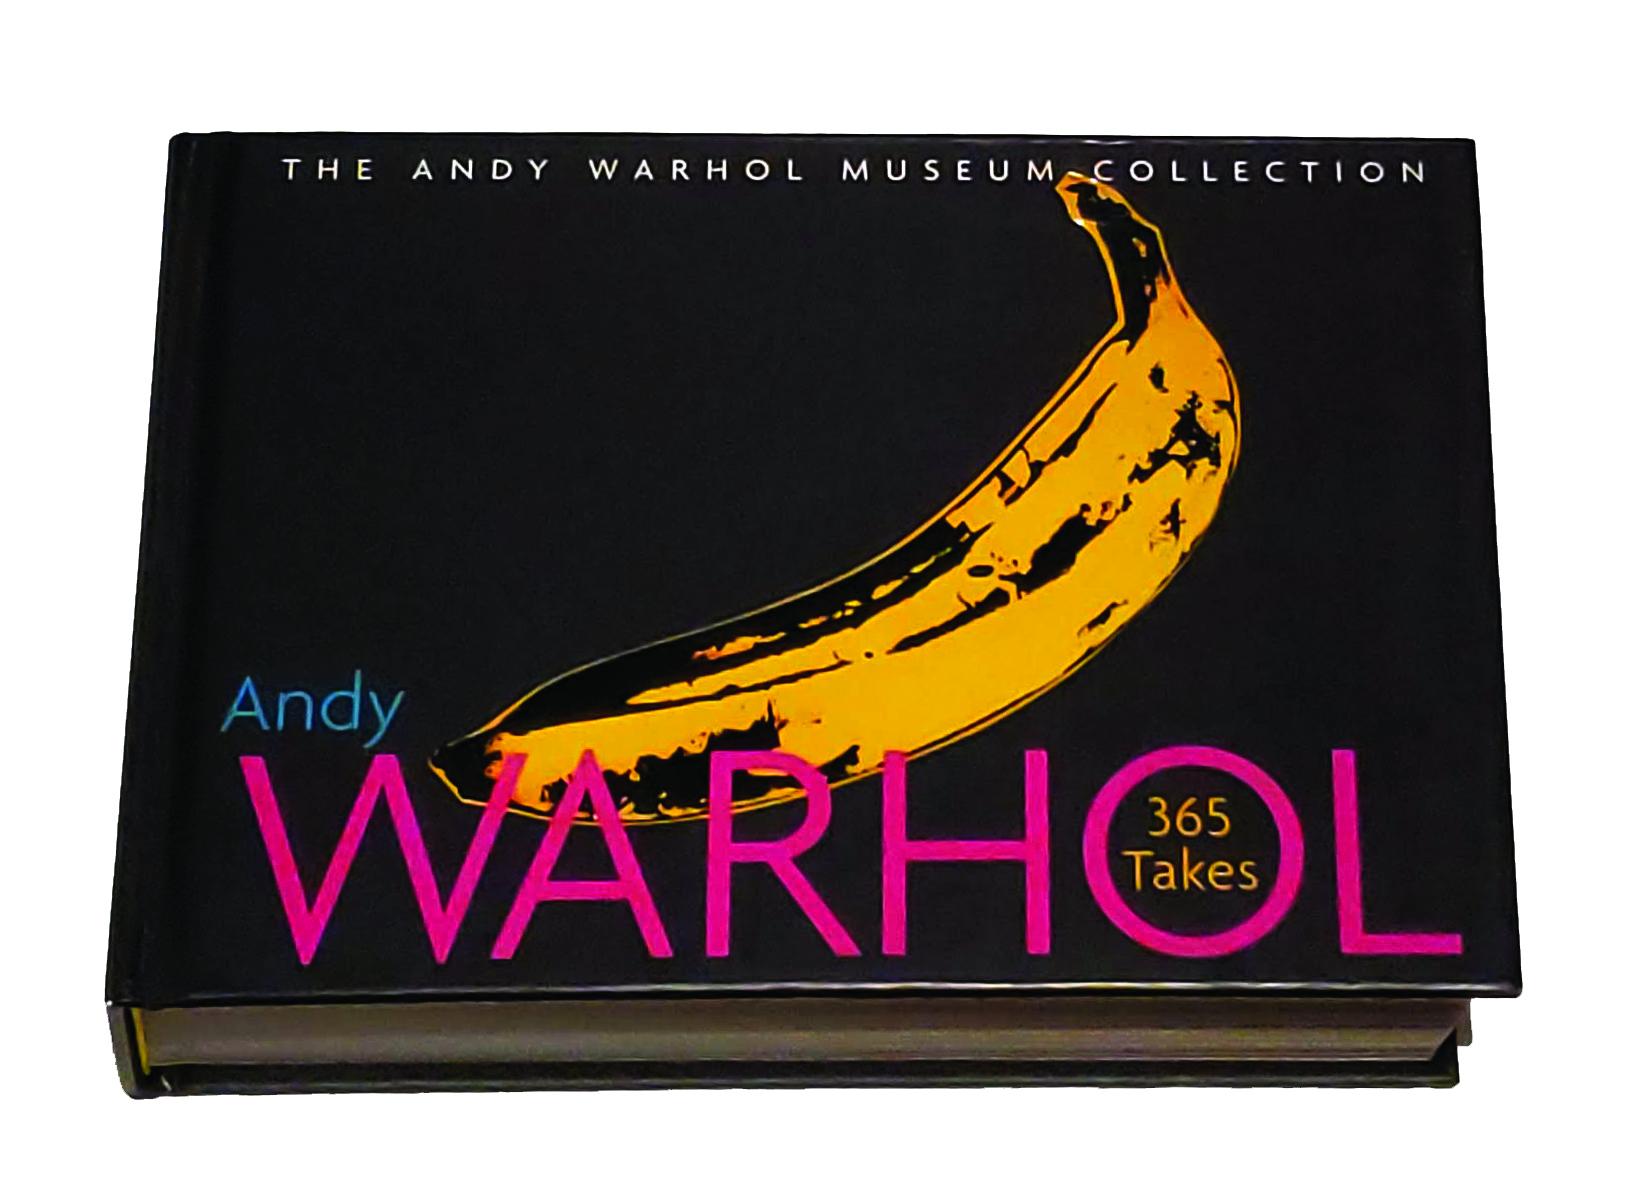 warhol 365 takes -